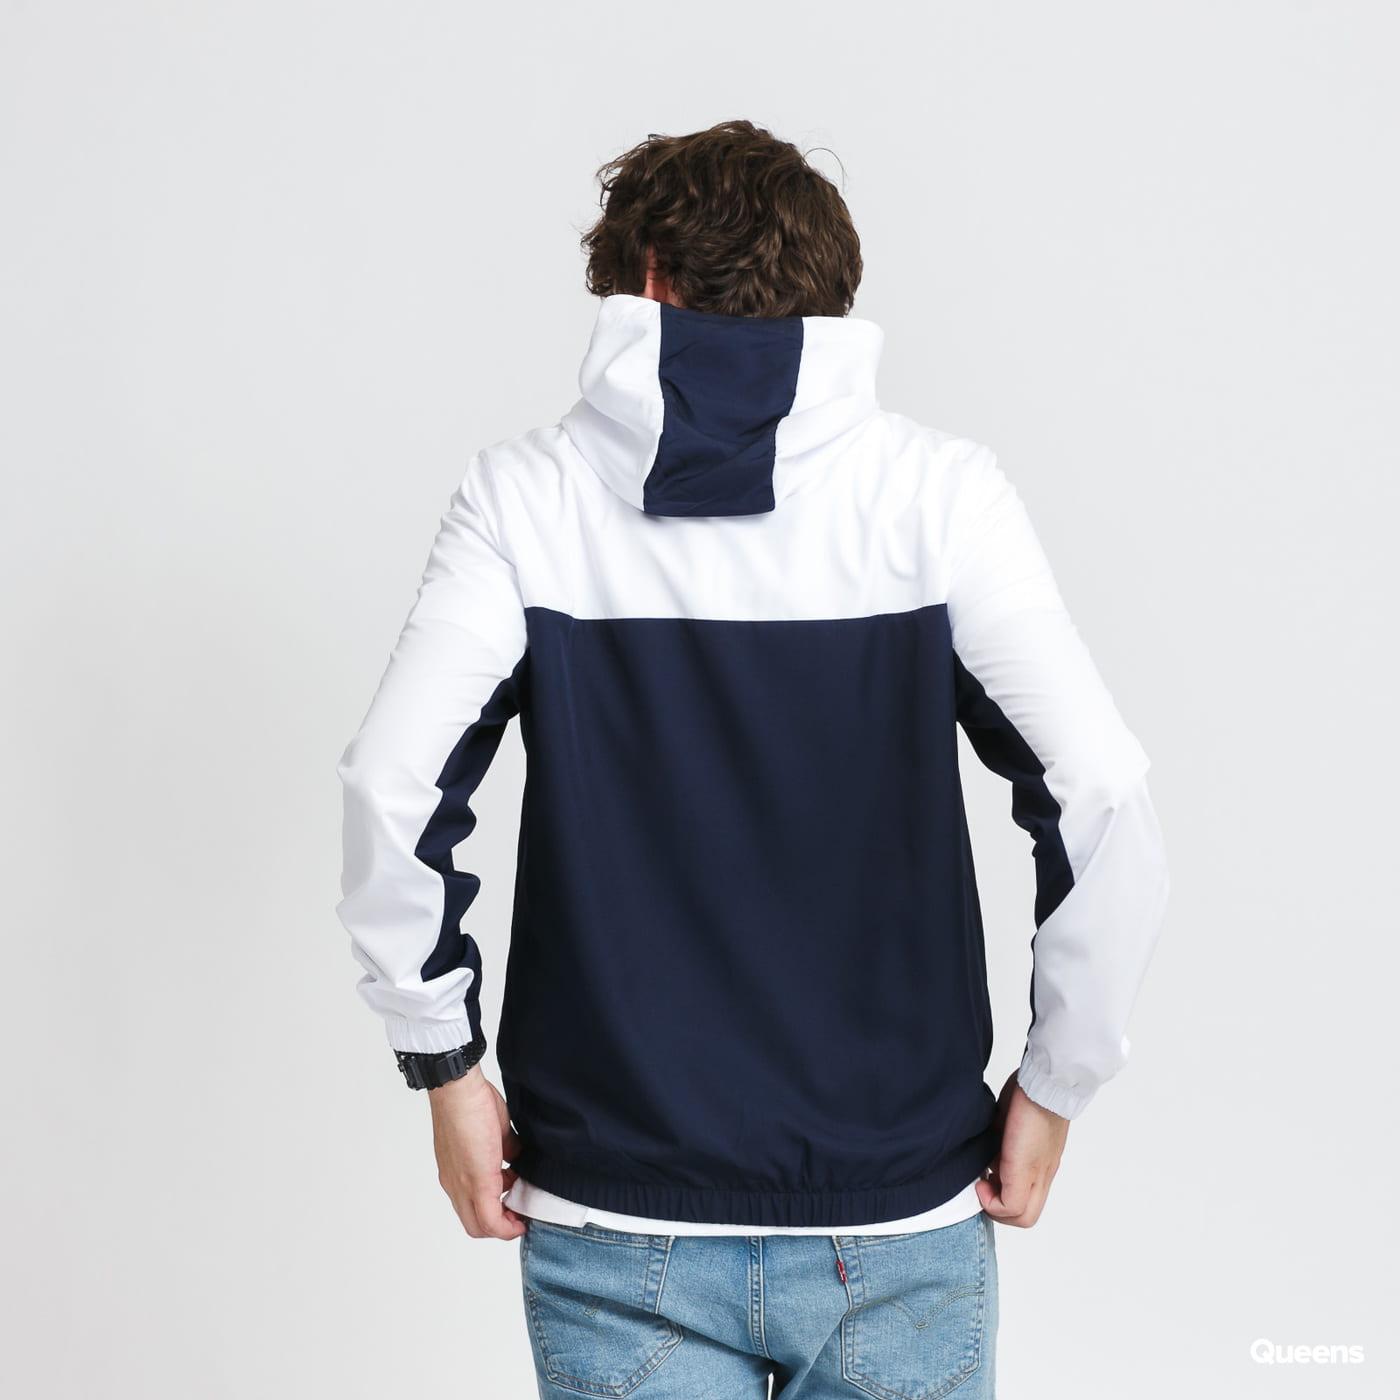 LACOSTE Men's Sport Colourblock Zip Jacket navy / white